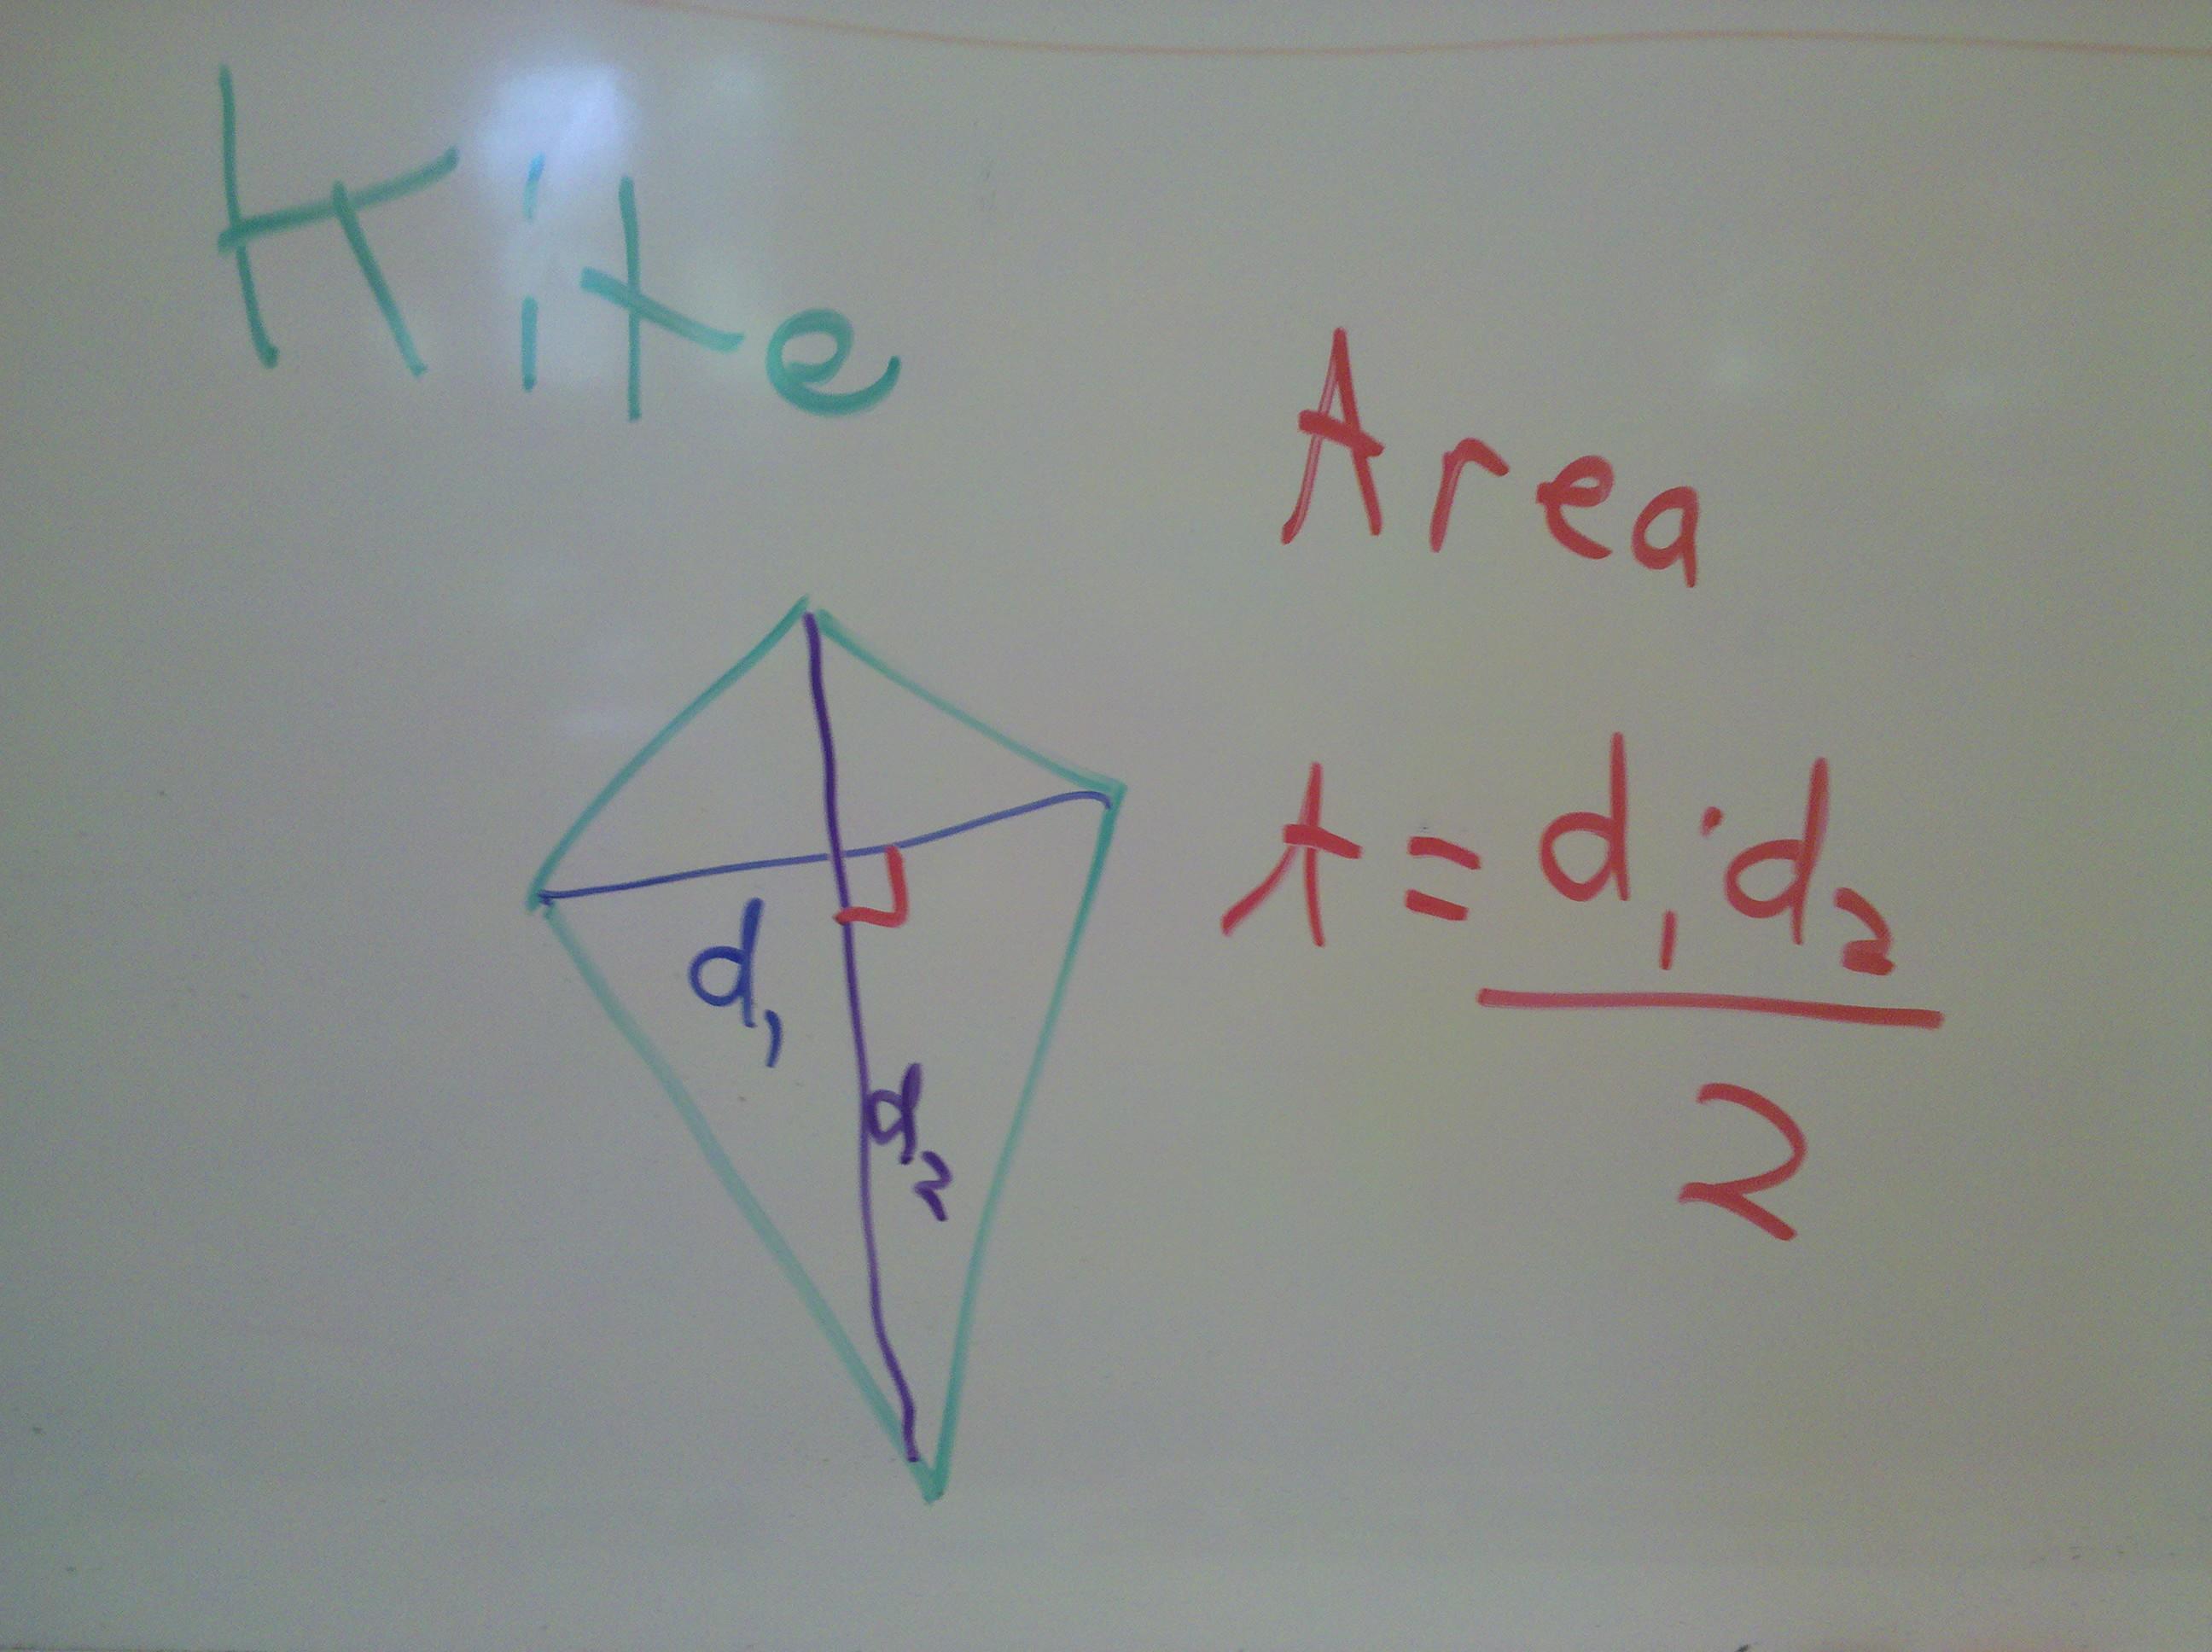 Gebhard Curt Geometrynotes Kite Diagrams Youtube Rhombus Tetragon